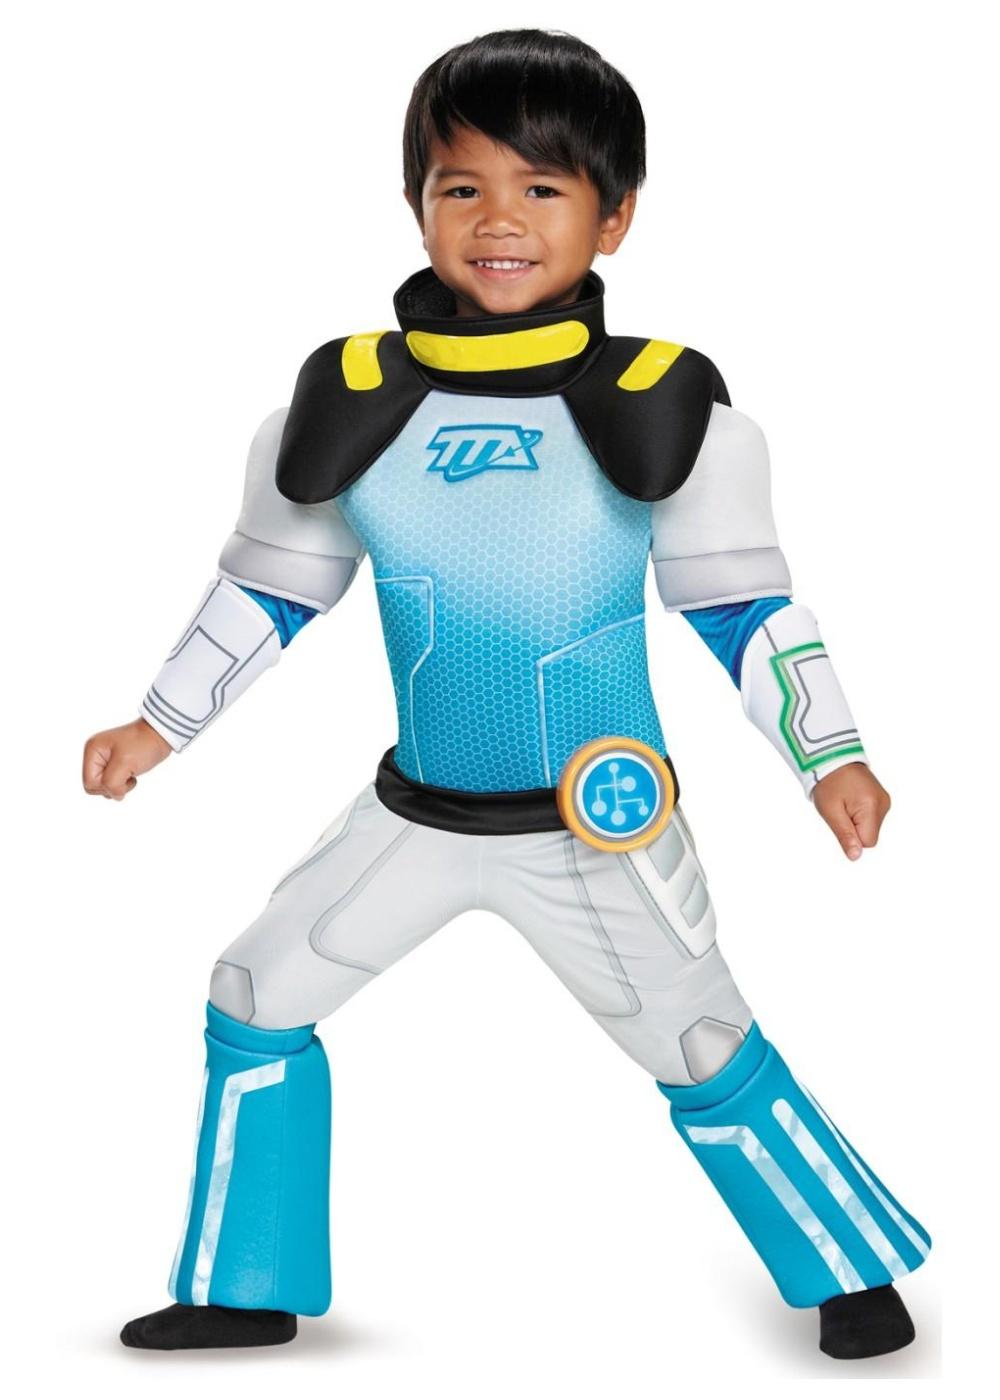 Miles Tomorrowland Toddler Boys Costume Show